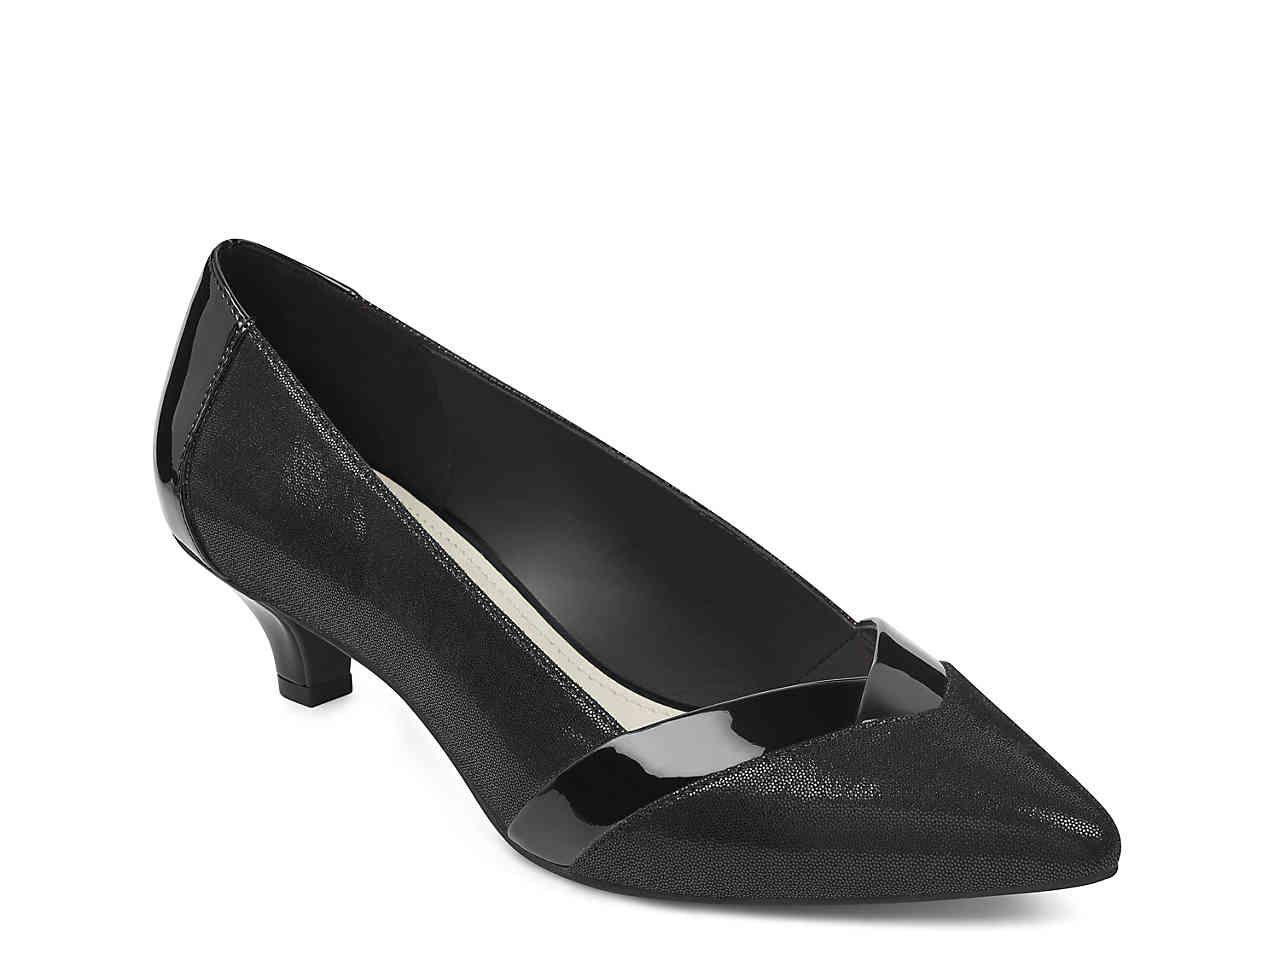 Anne Klein Maureen Pump Women S Shoes Dsw Black Pumps Low Heel Women Shoes Kitten Heel Pumps